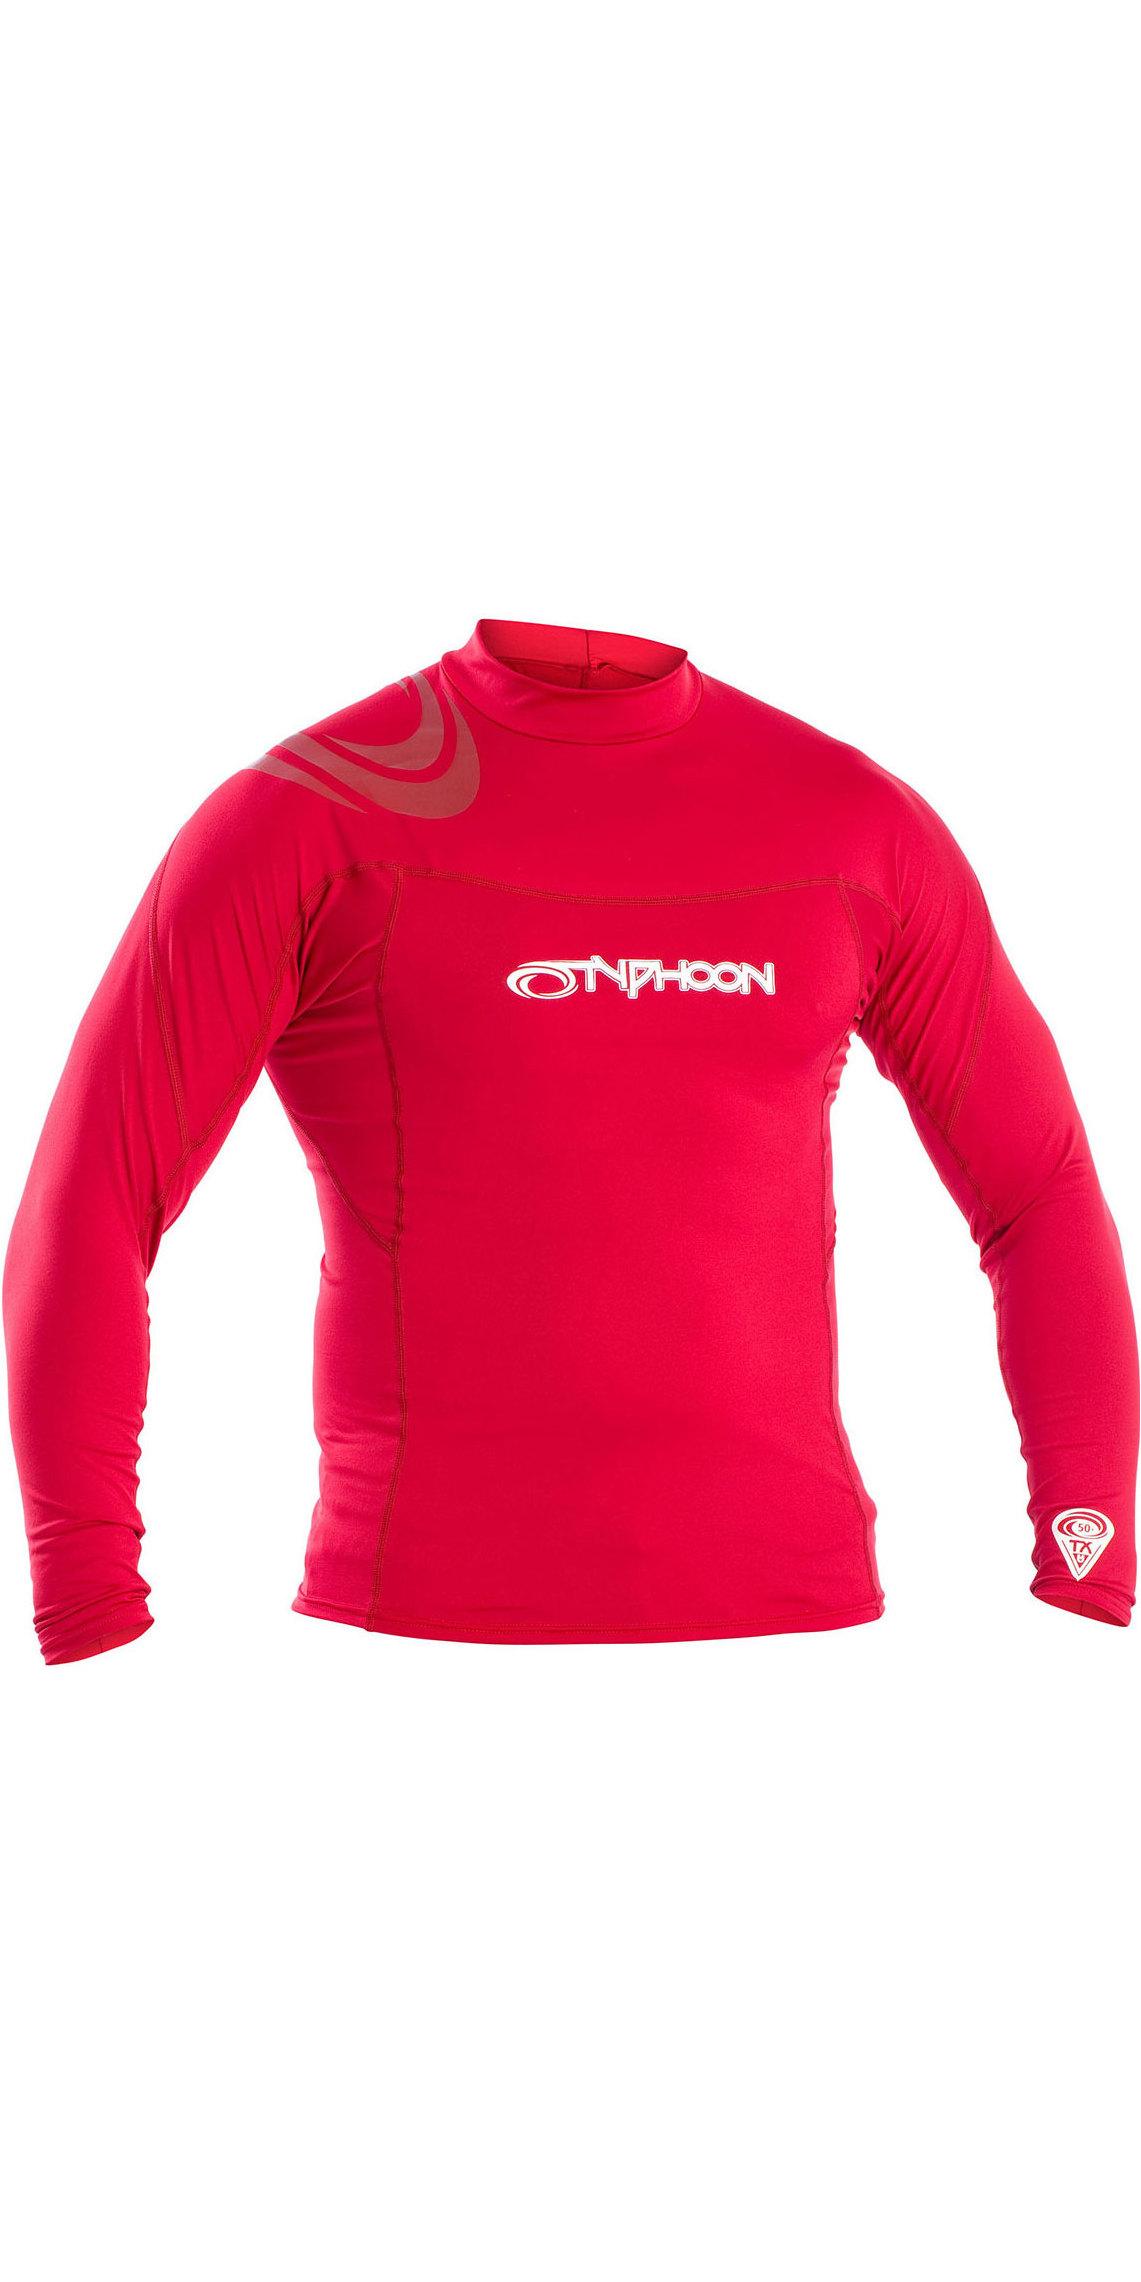 2019 Typhoon Mens Long Sleeve Rash Vest Rich Red 430012